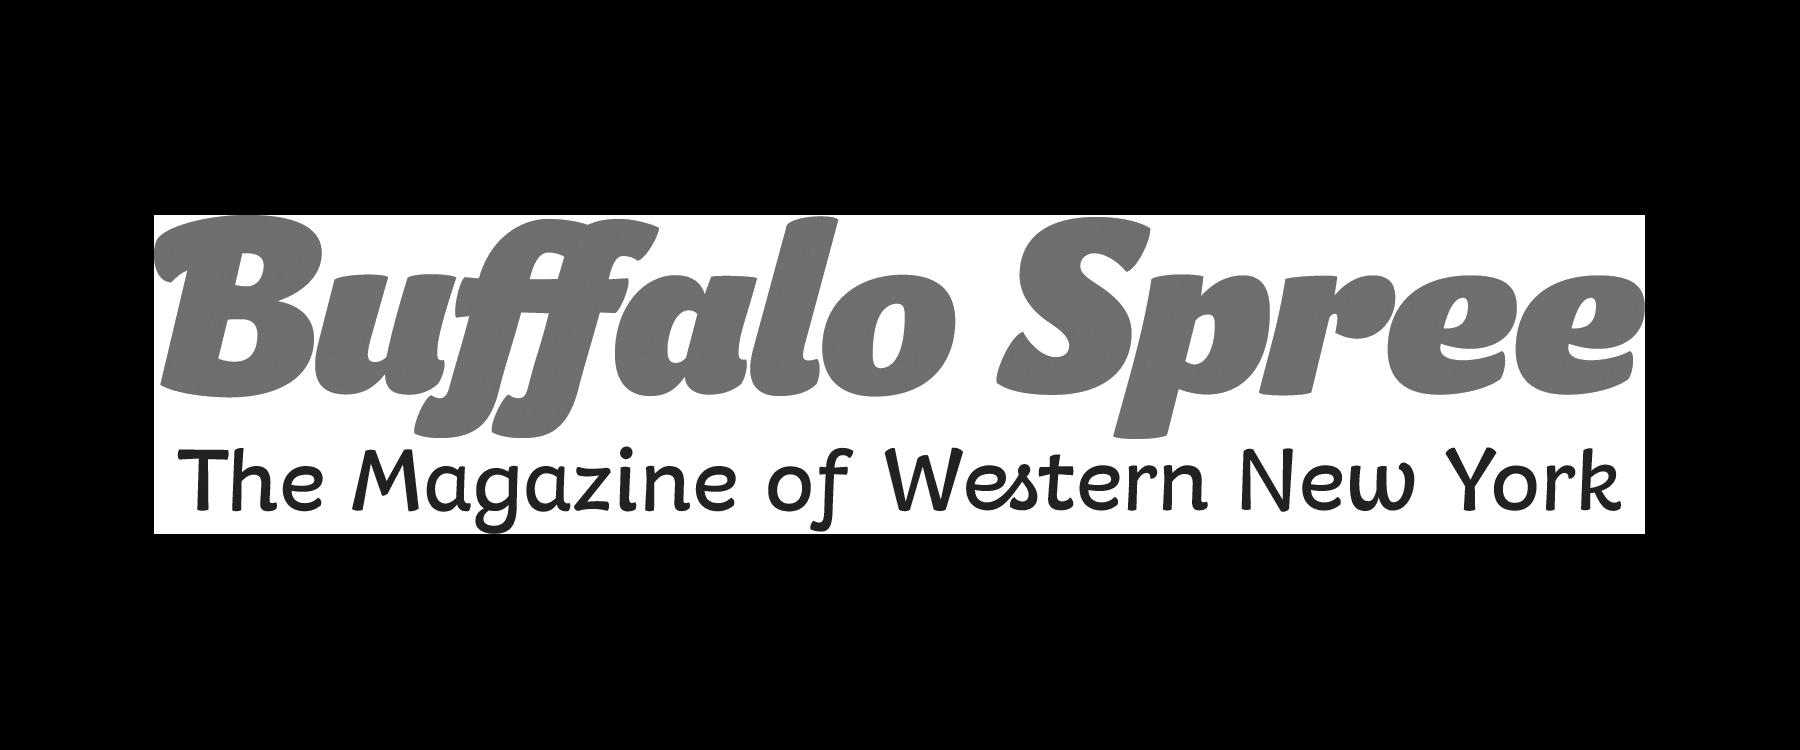 Spree-Logo-8.16.png